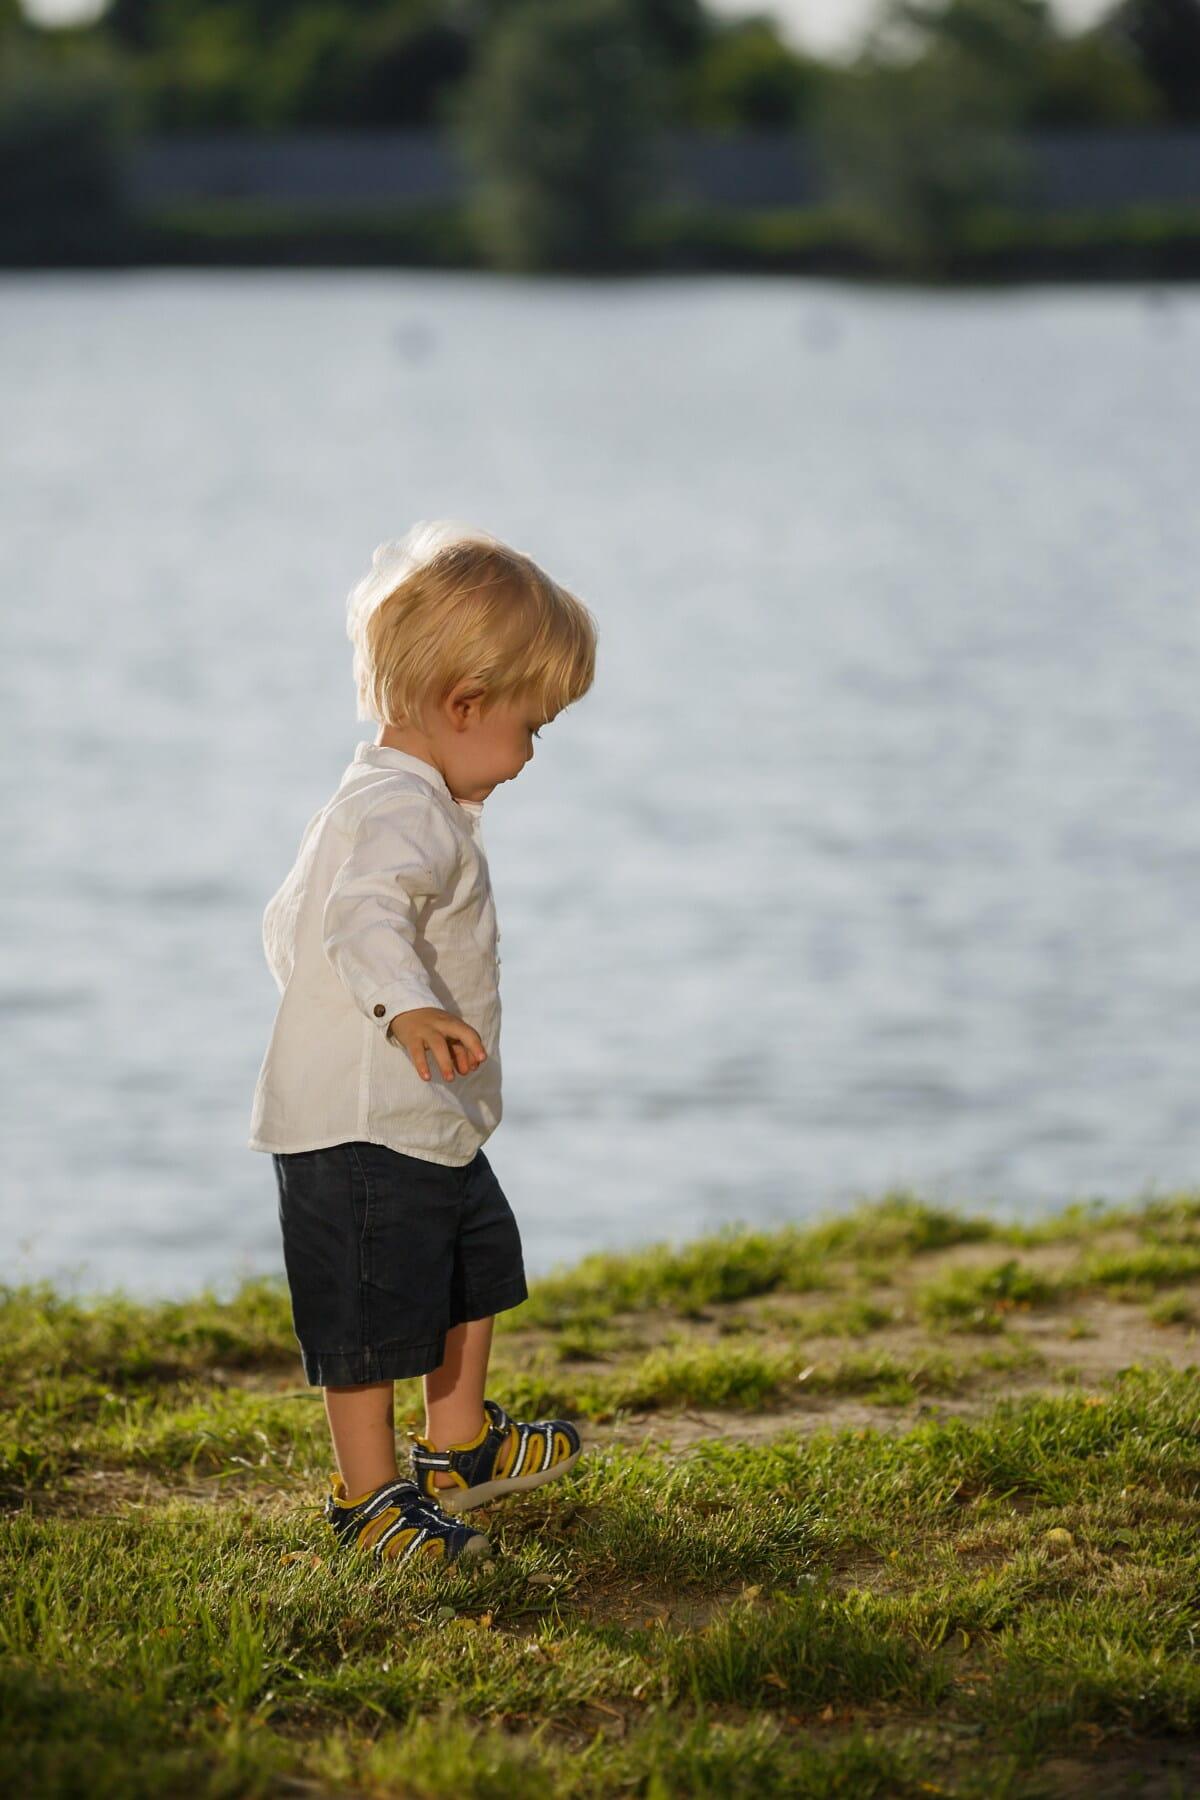 walking, blonde hair, toddler, side view, sneakers, shorts, child, happy, fun, water